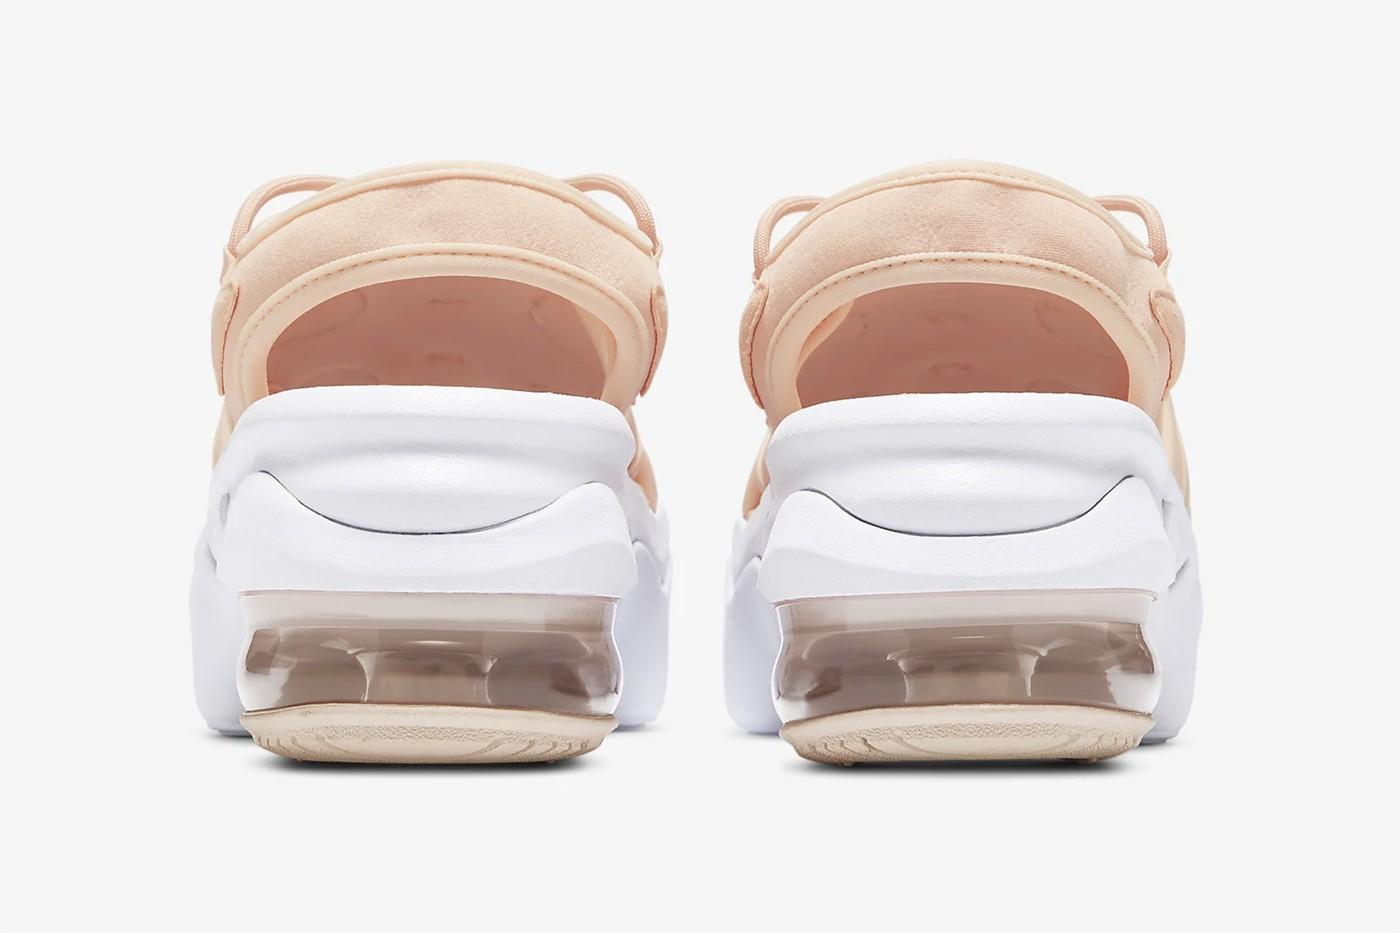 nike air max koko chunky sandals platform pink coral colorway release